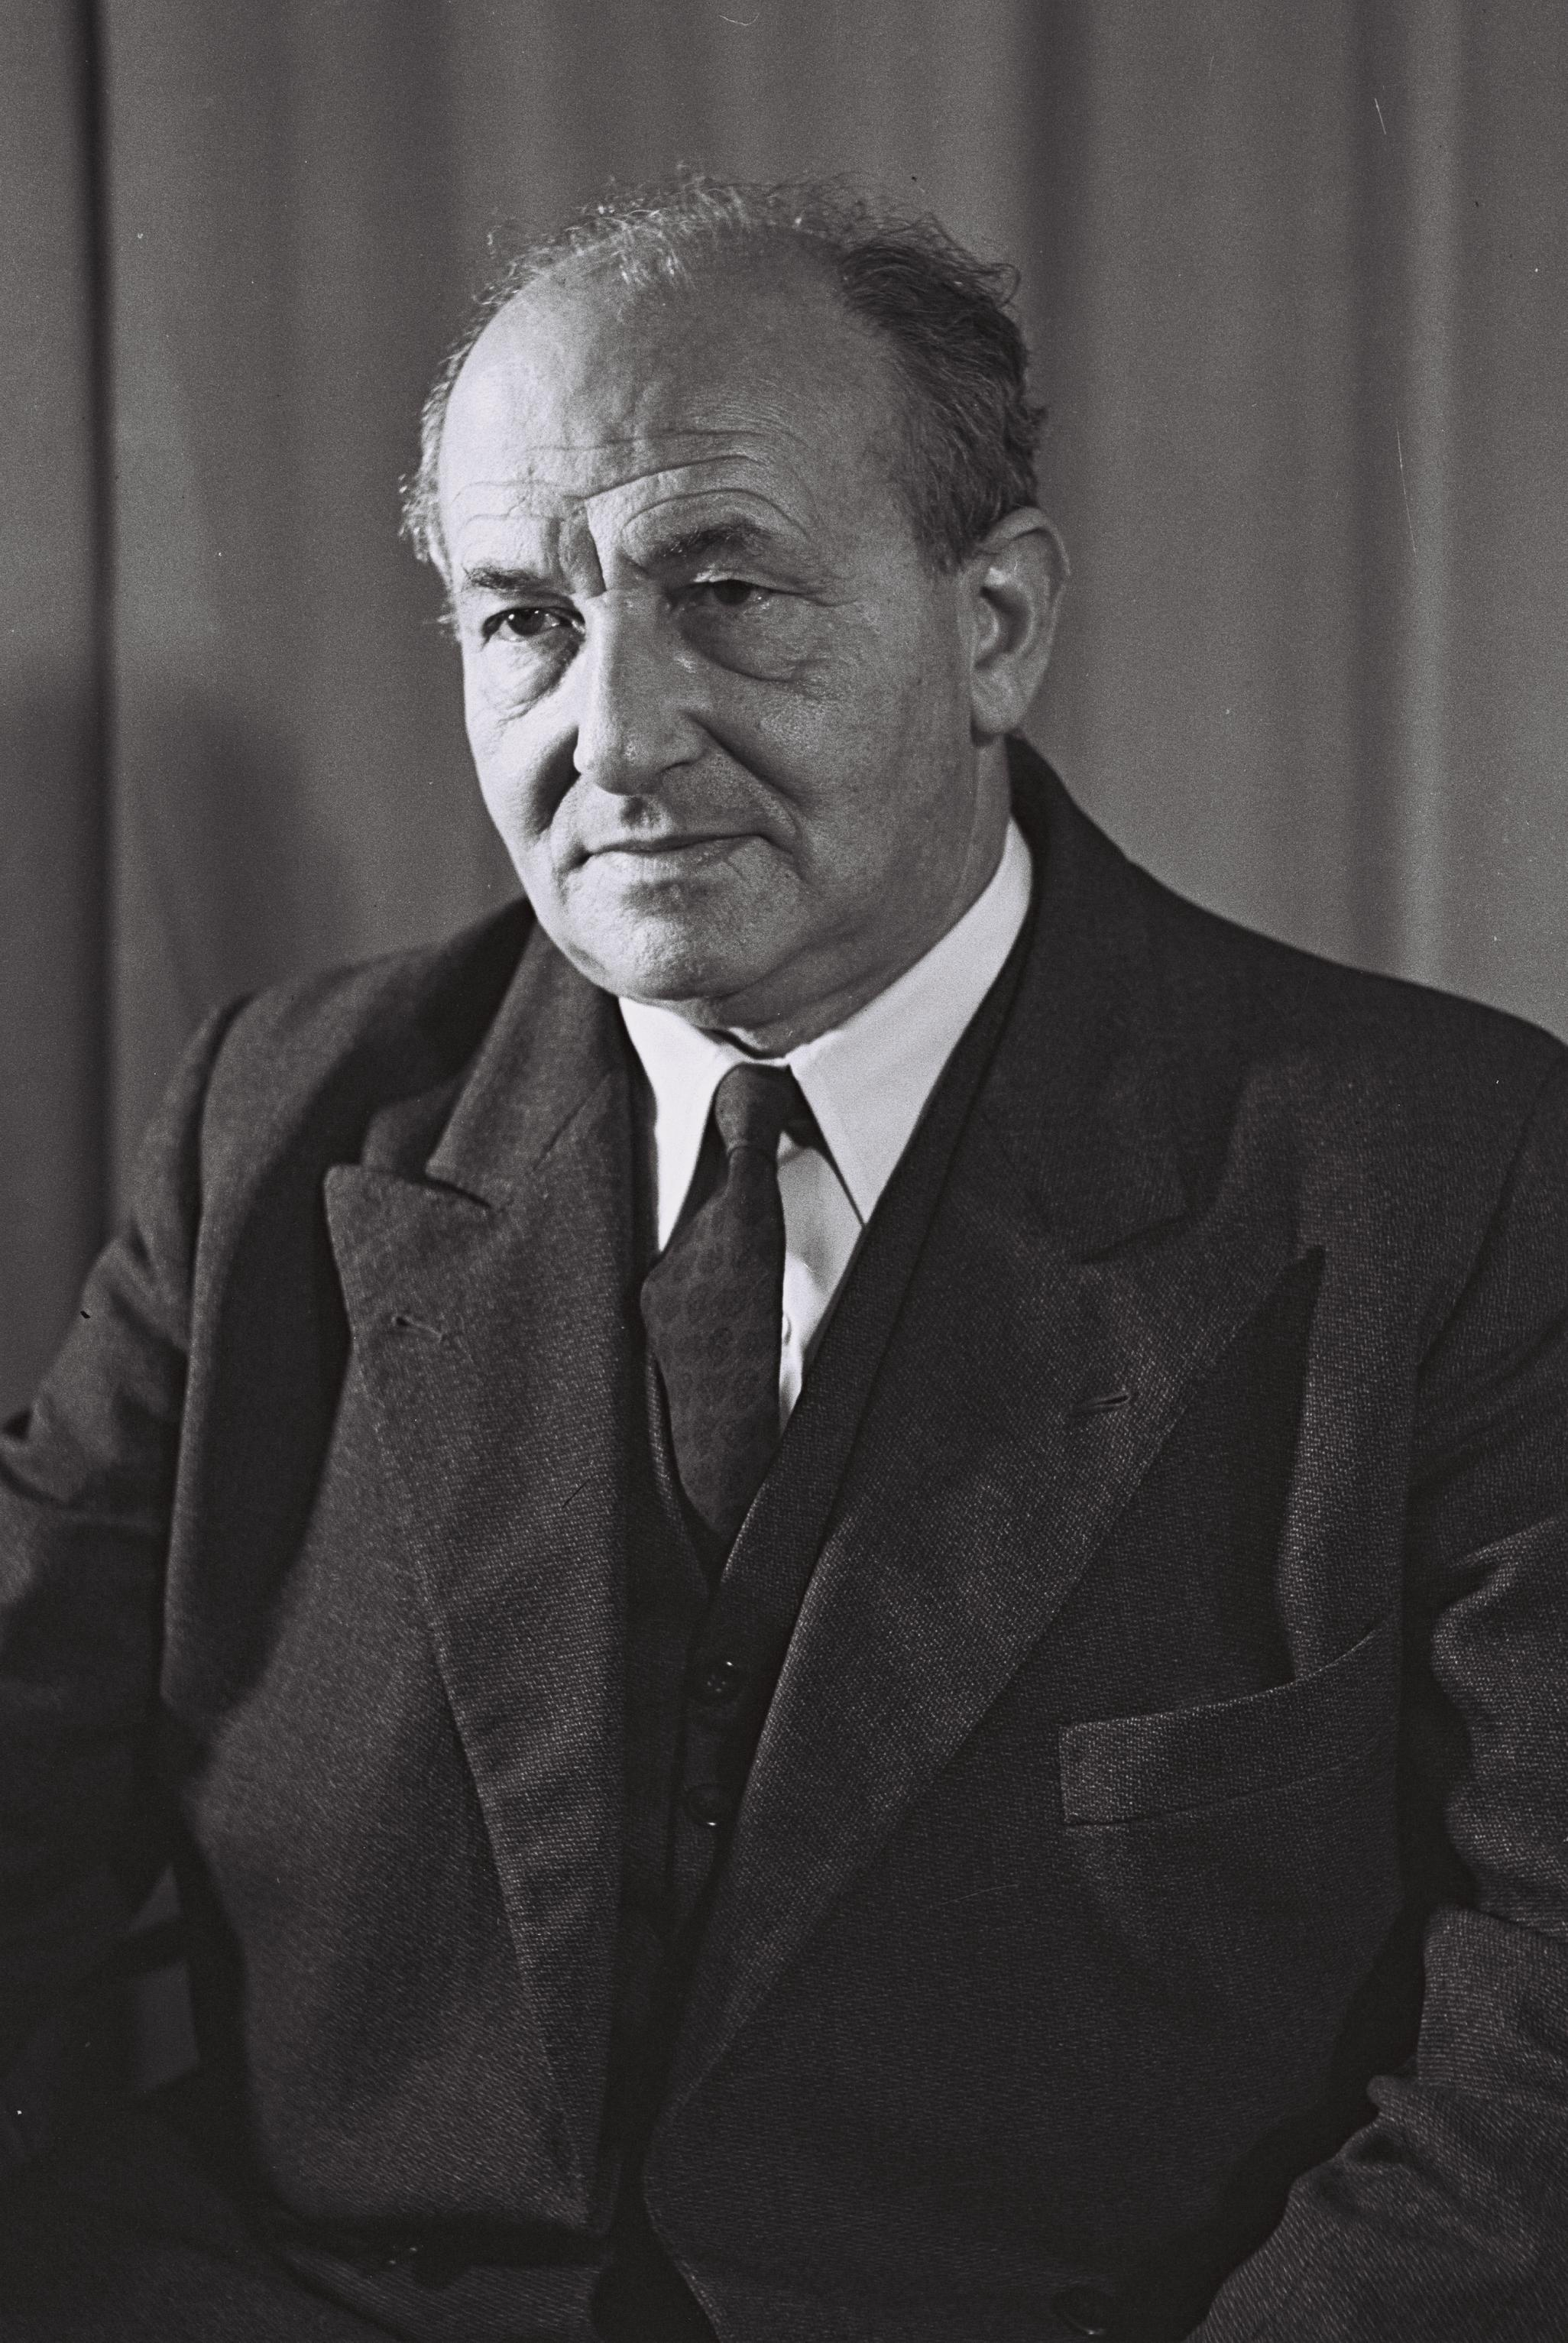 yaakov ahimeir biography of william